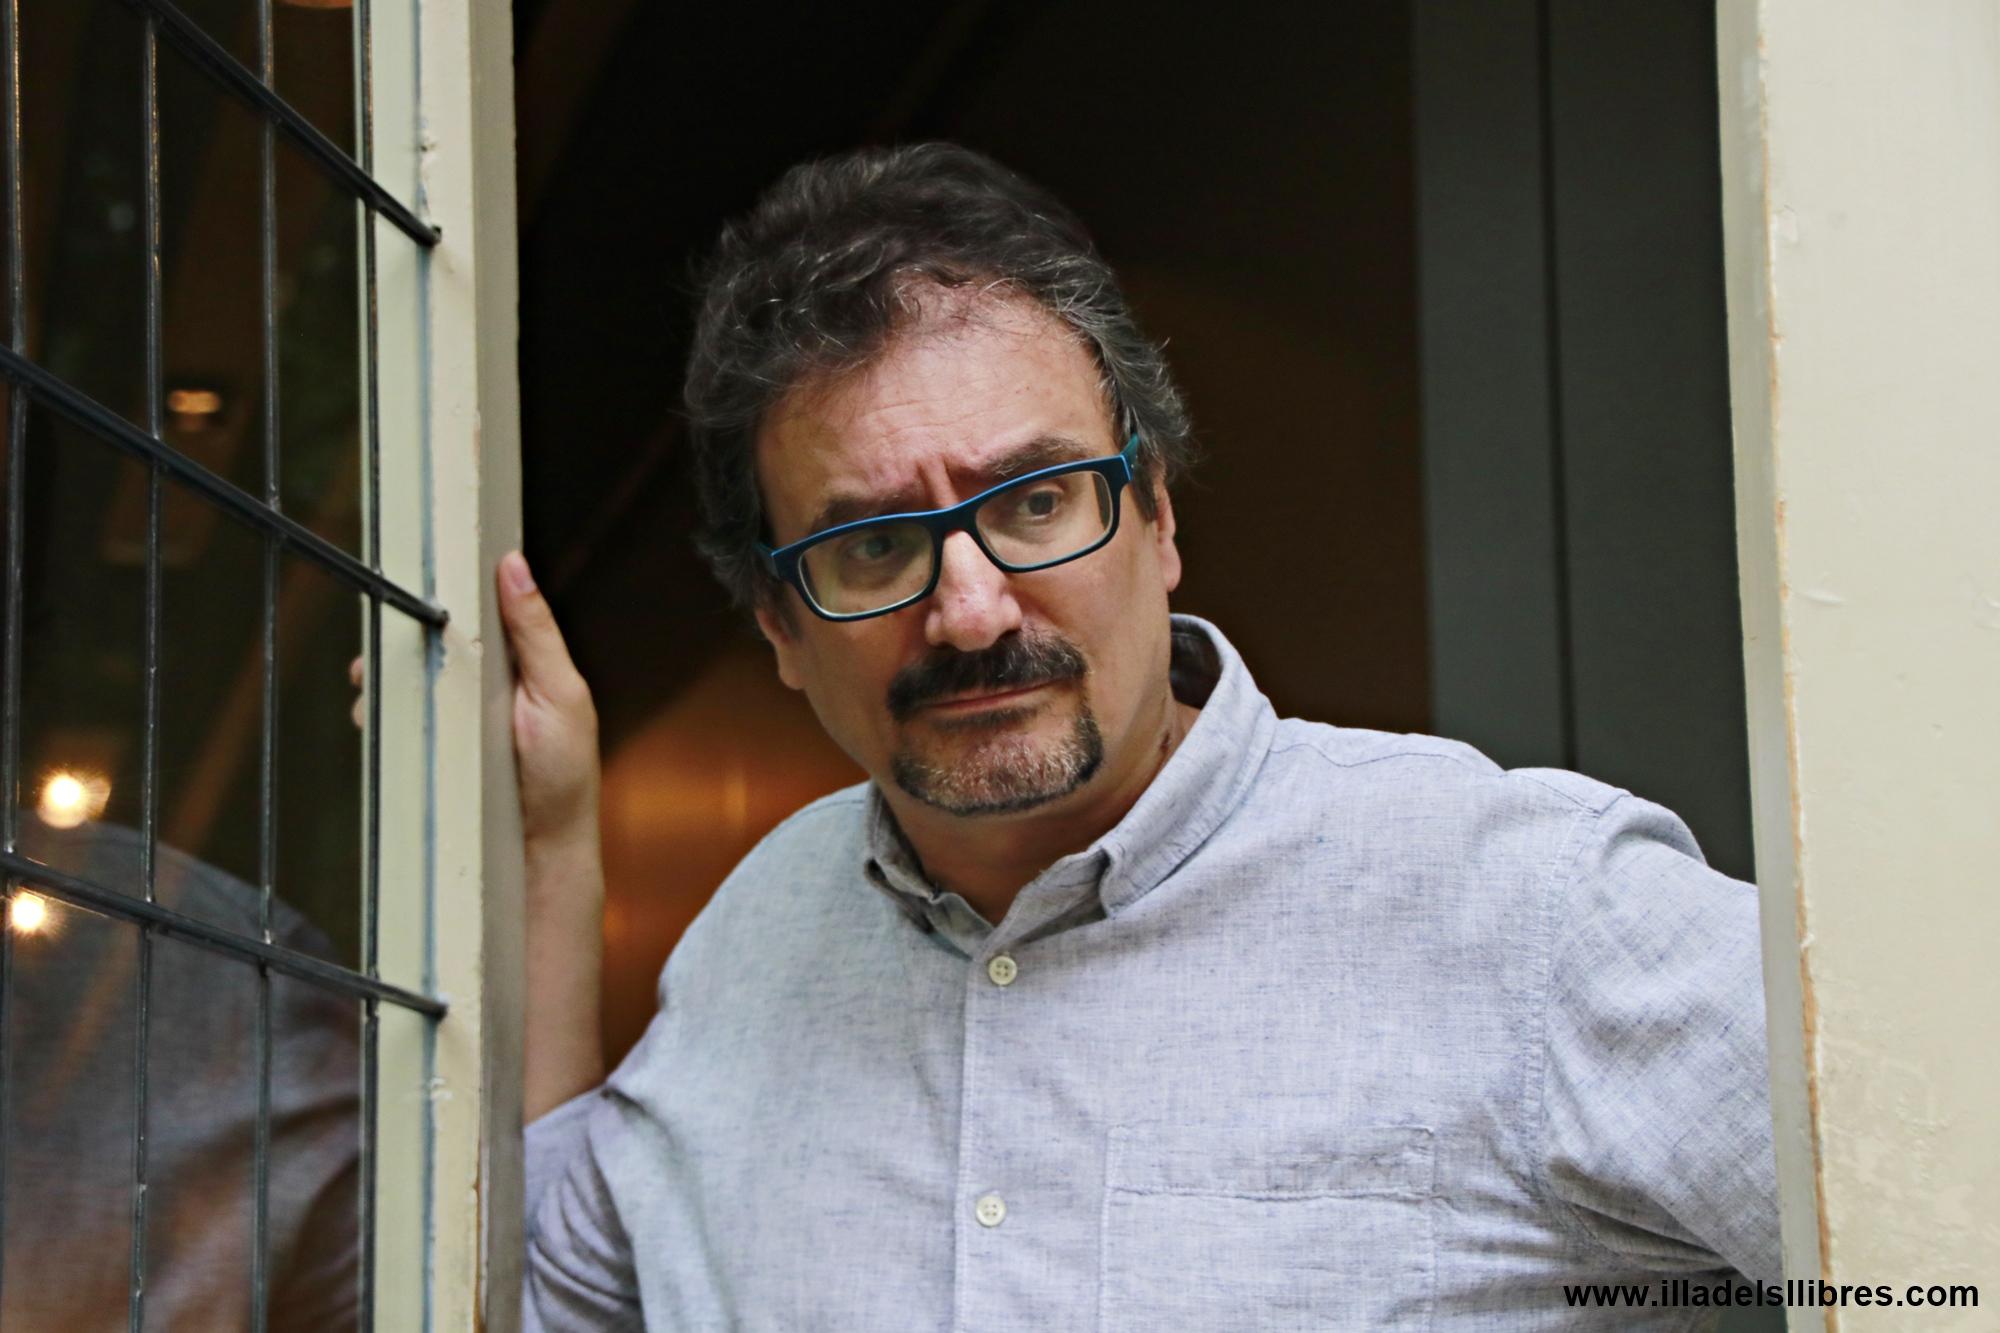 Albert-Sánchez-Piñol-2019-01